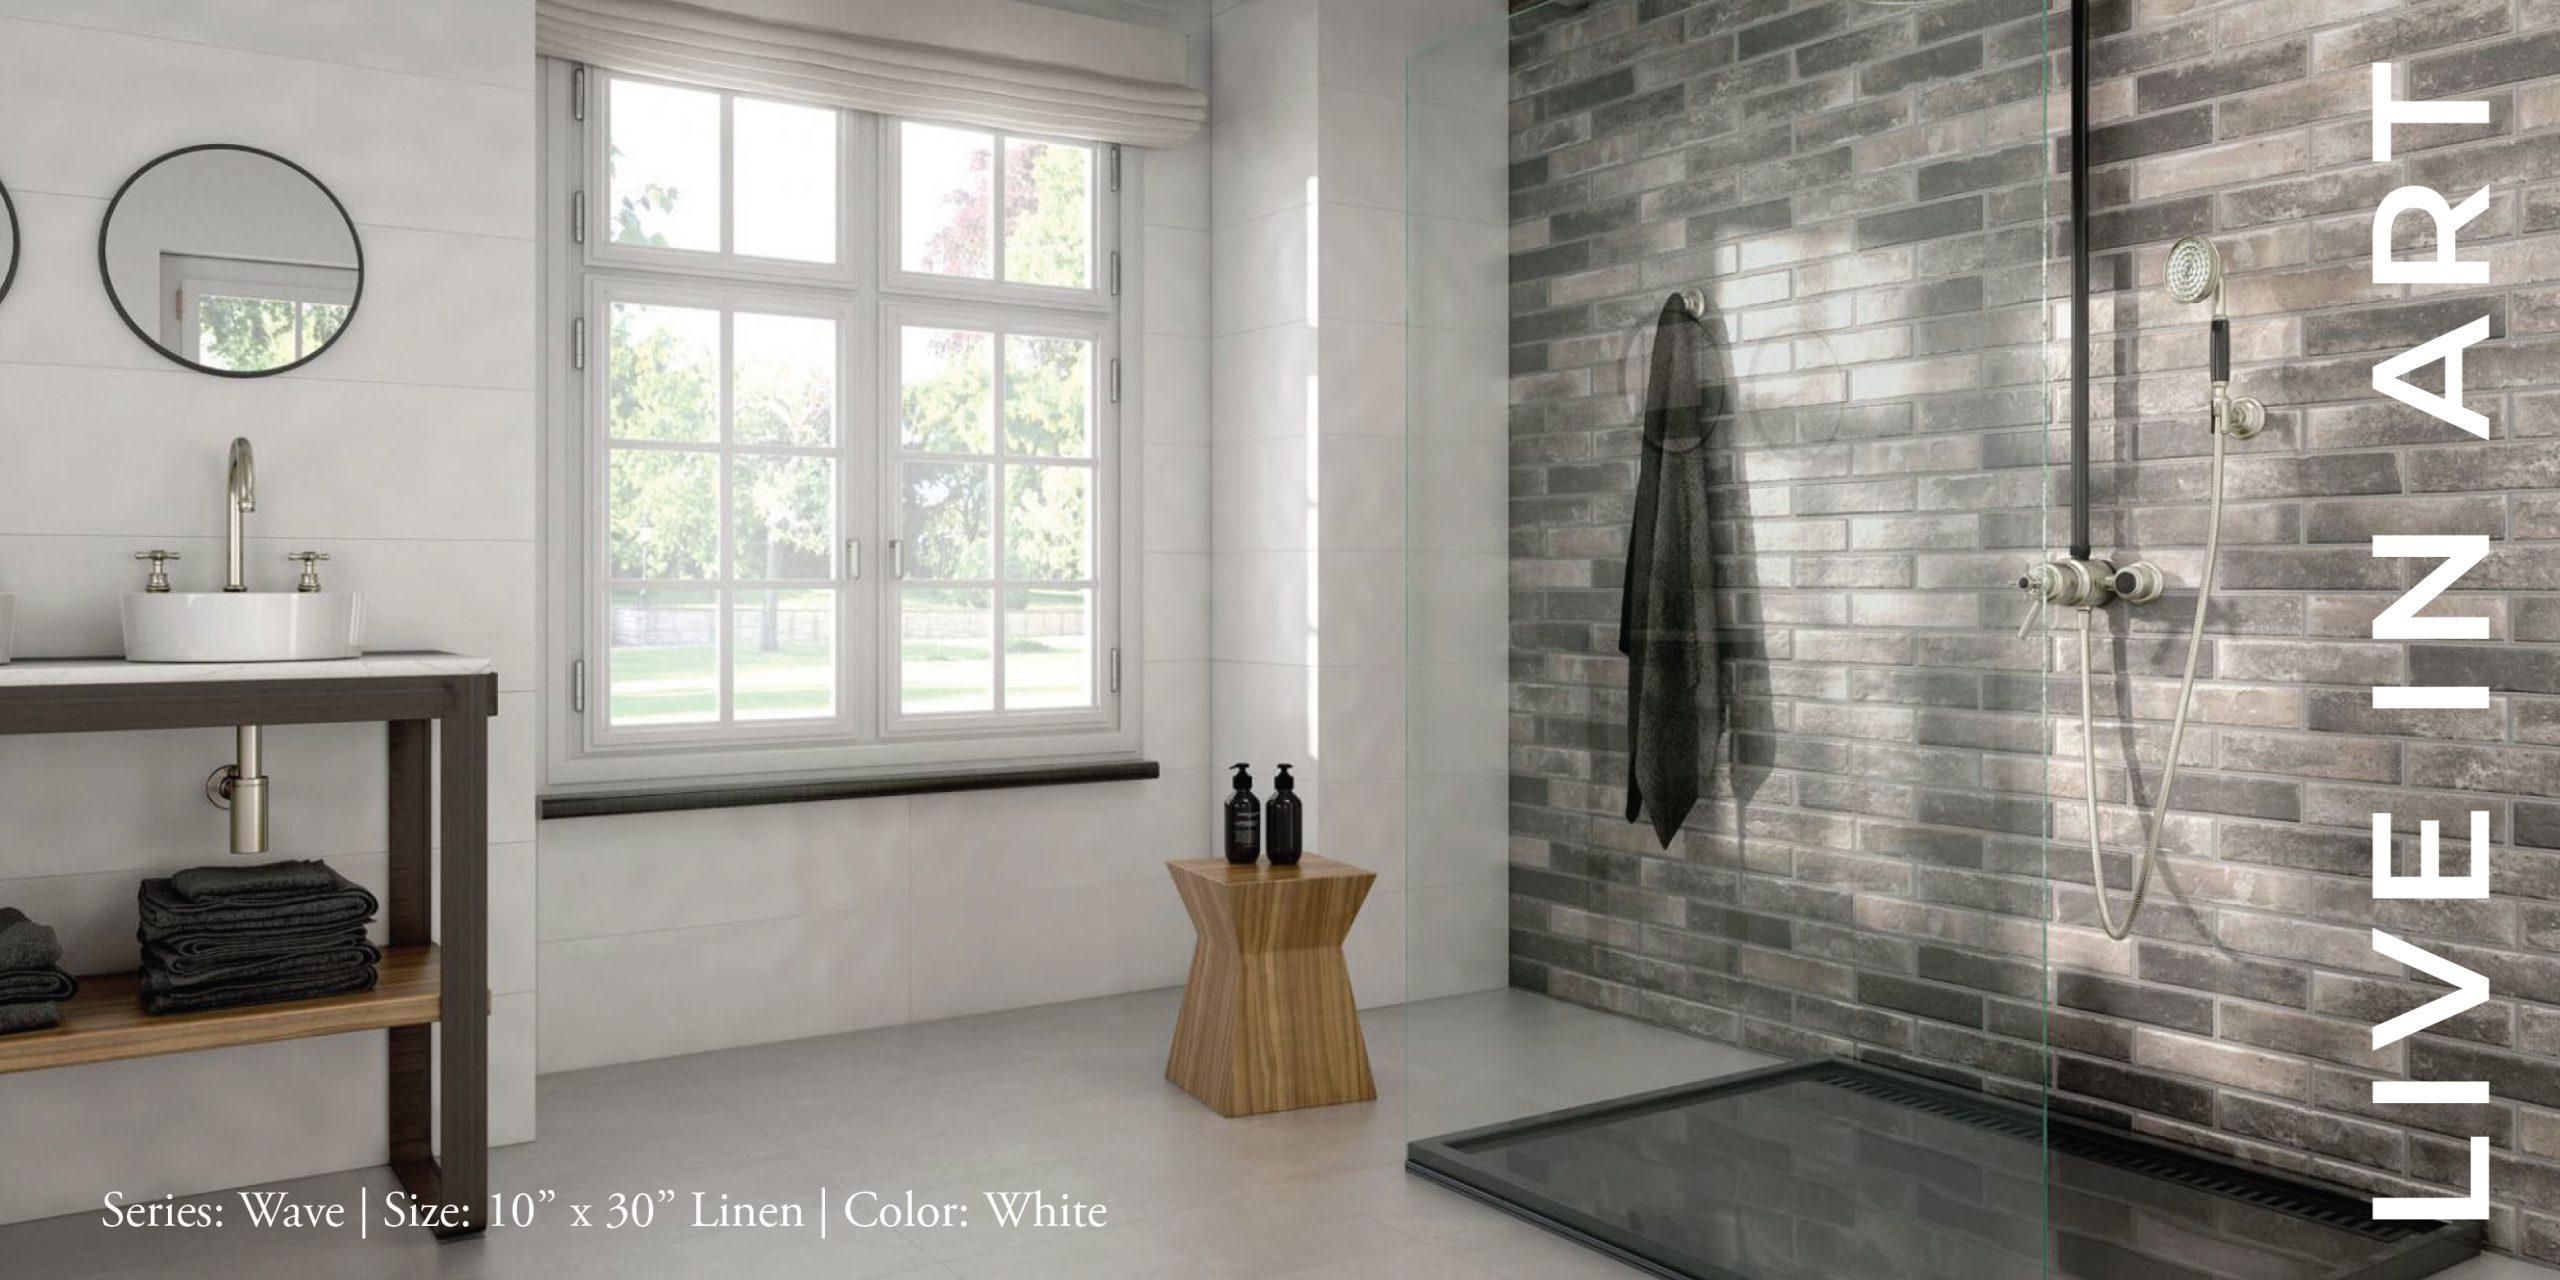 Wave White 10x30 Linen